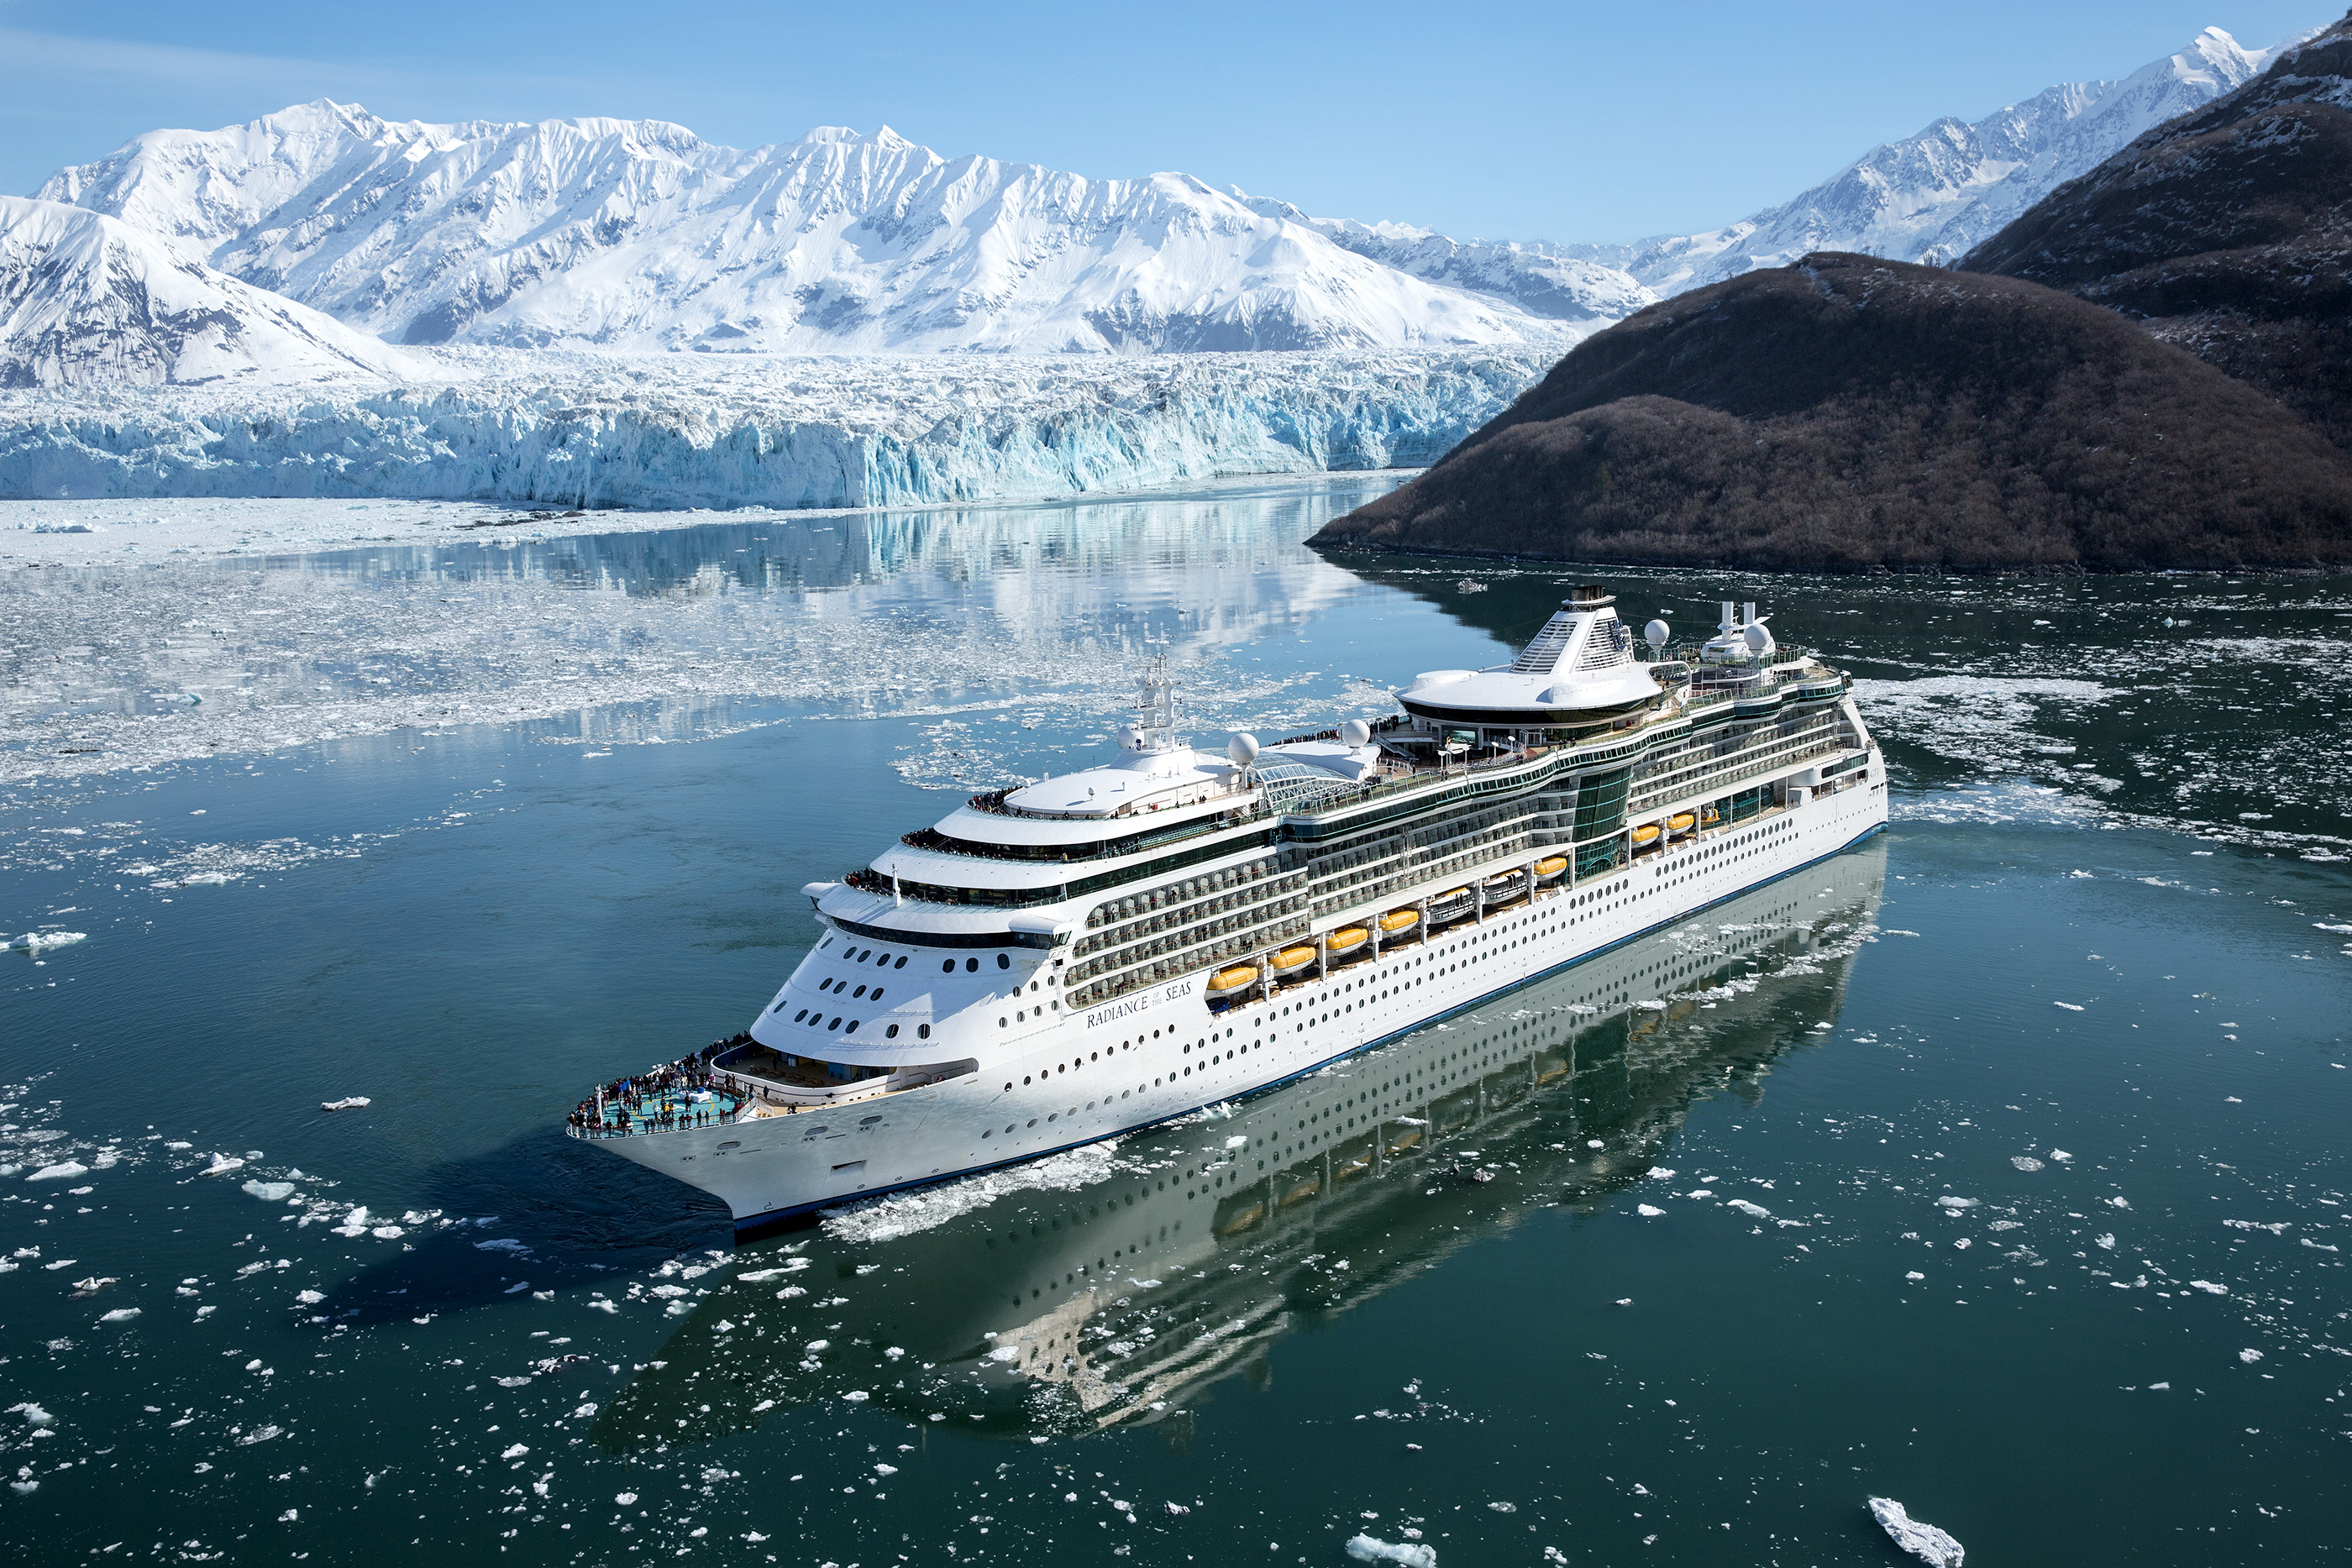 Cruise To Alaska 2020.Cruises Alaska 2020 Alaska Cruise 2020 Best Cruises To